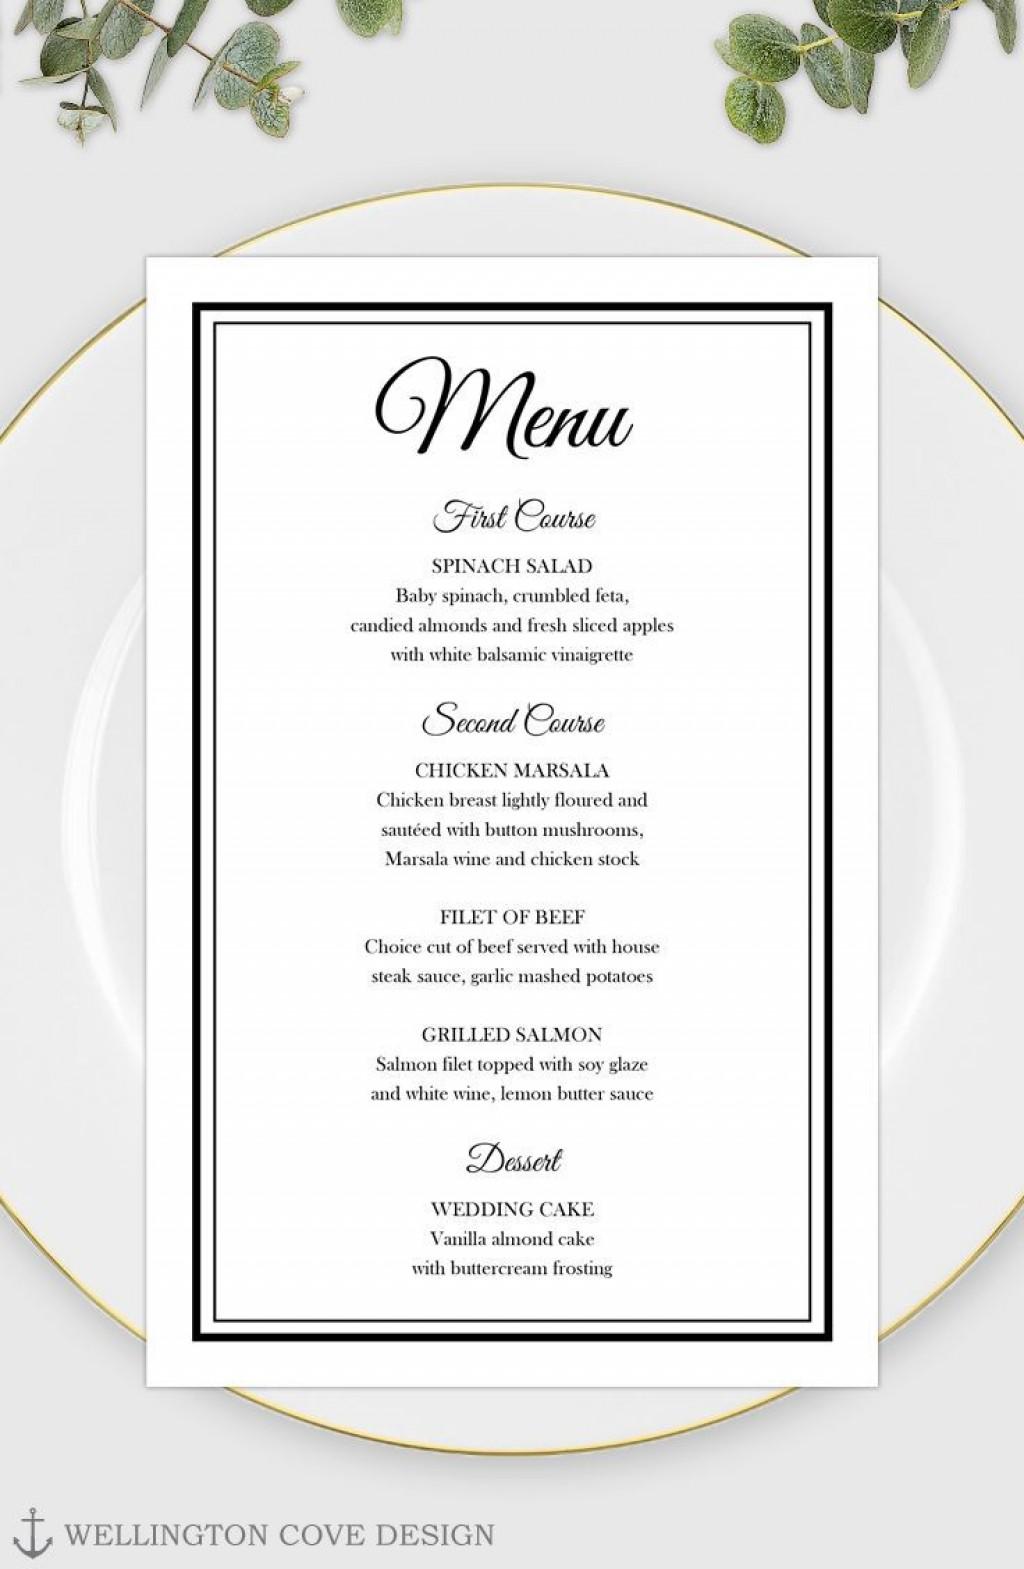 003 Stirring Elegant Wedding Menu Card Template Photo  TemplatesLarge